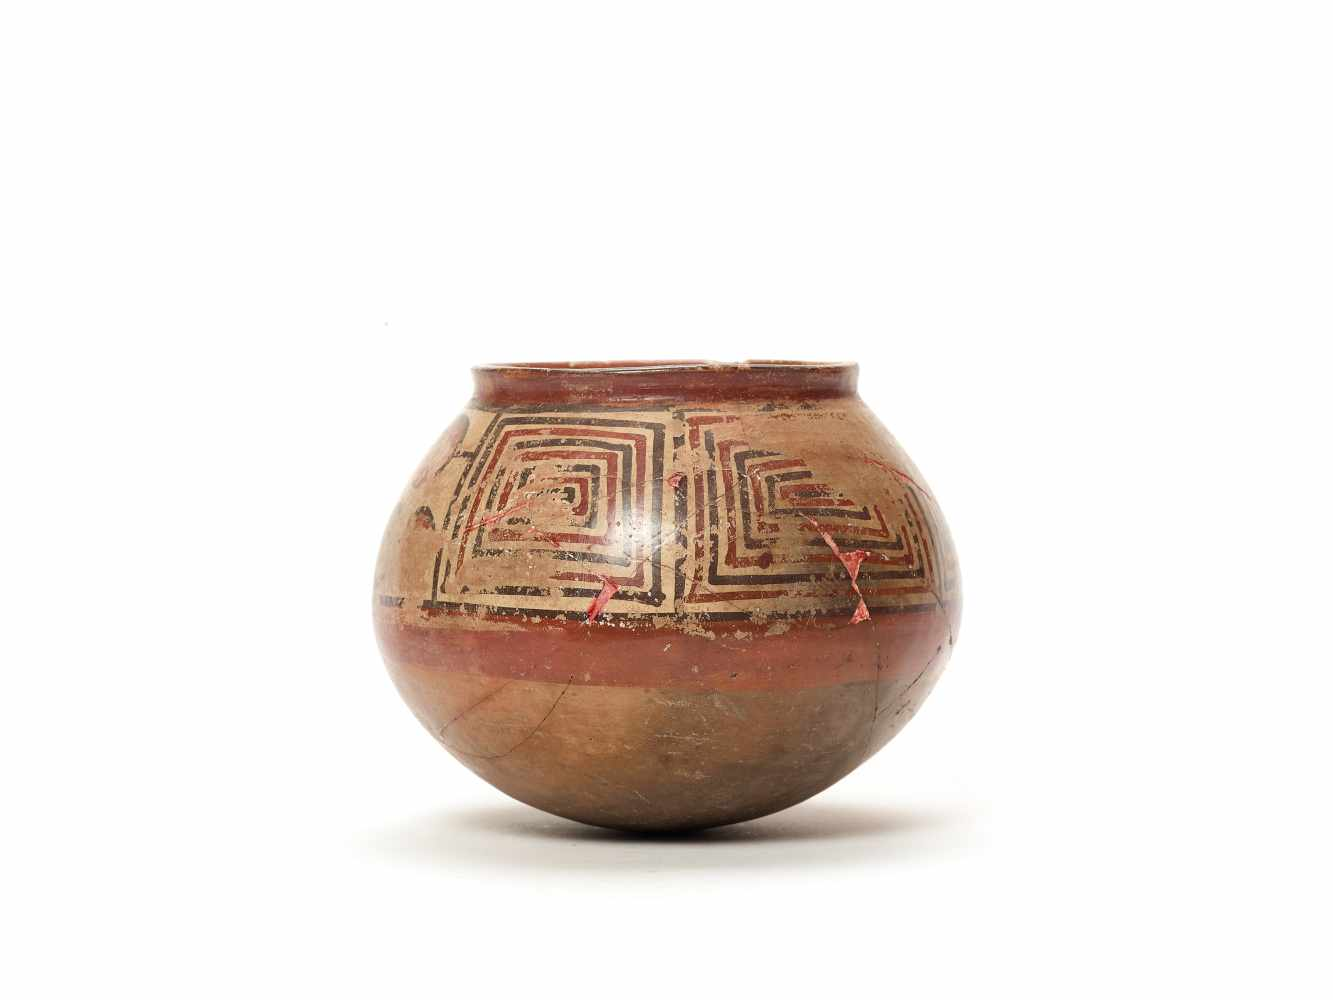 PAINTED CLAY POT - NAZCA, PERU, C. 300-600 ADPainted clayNazca, Peru, c. 300-600 ADSpherical form - Image 2 of 3